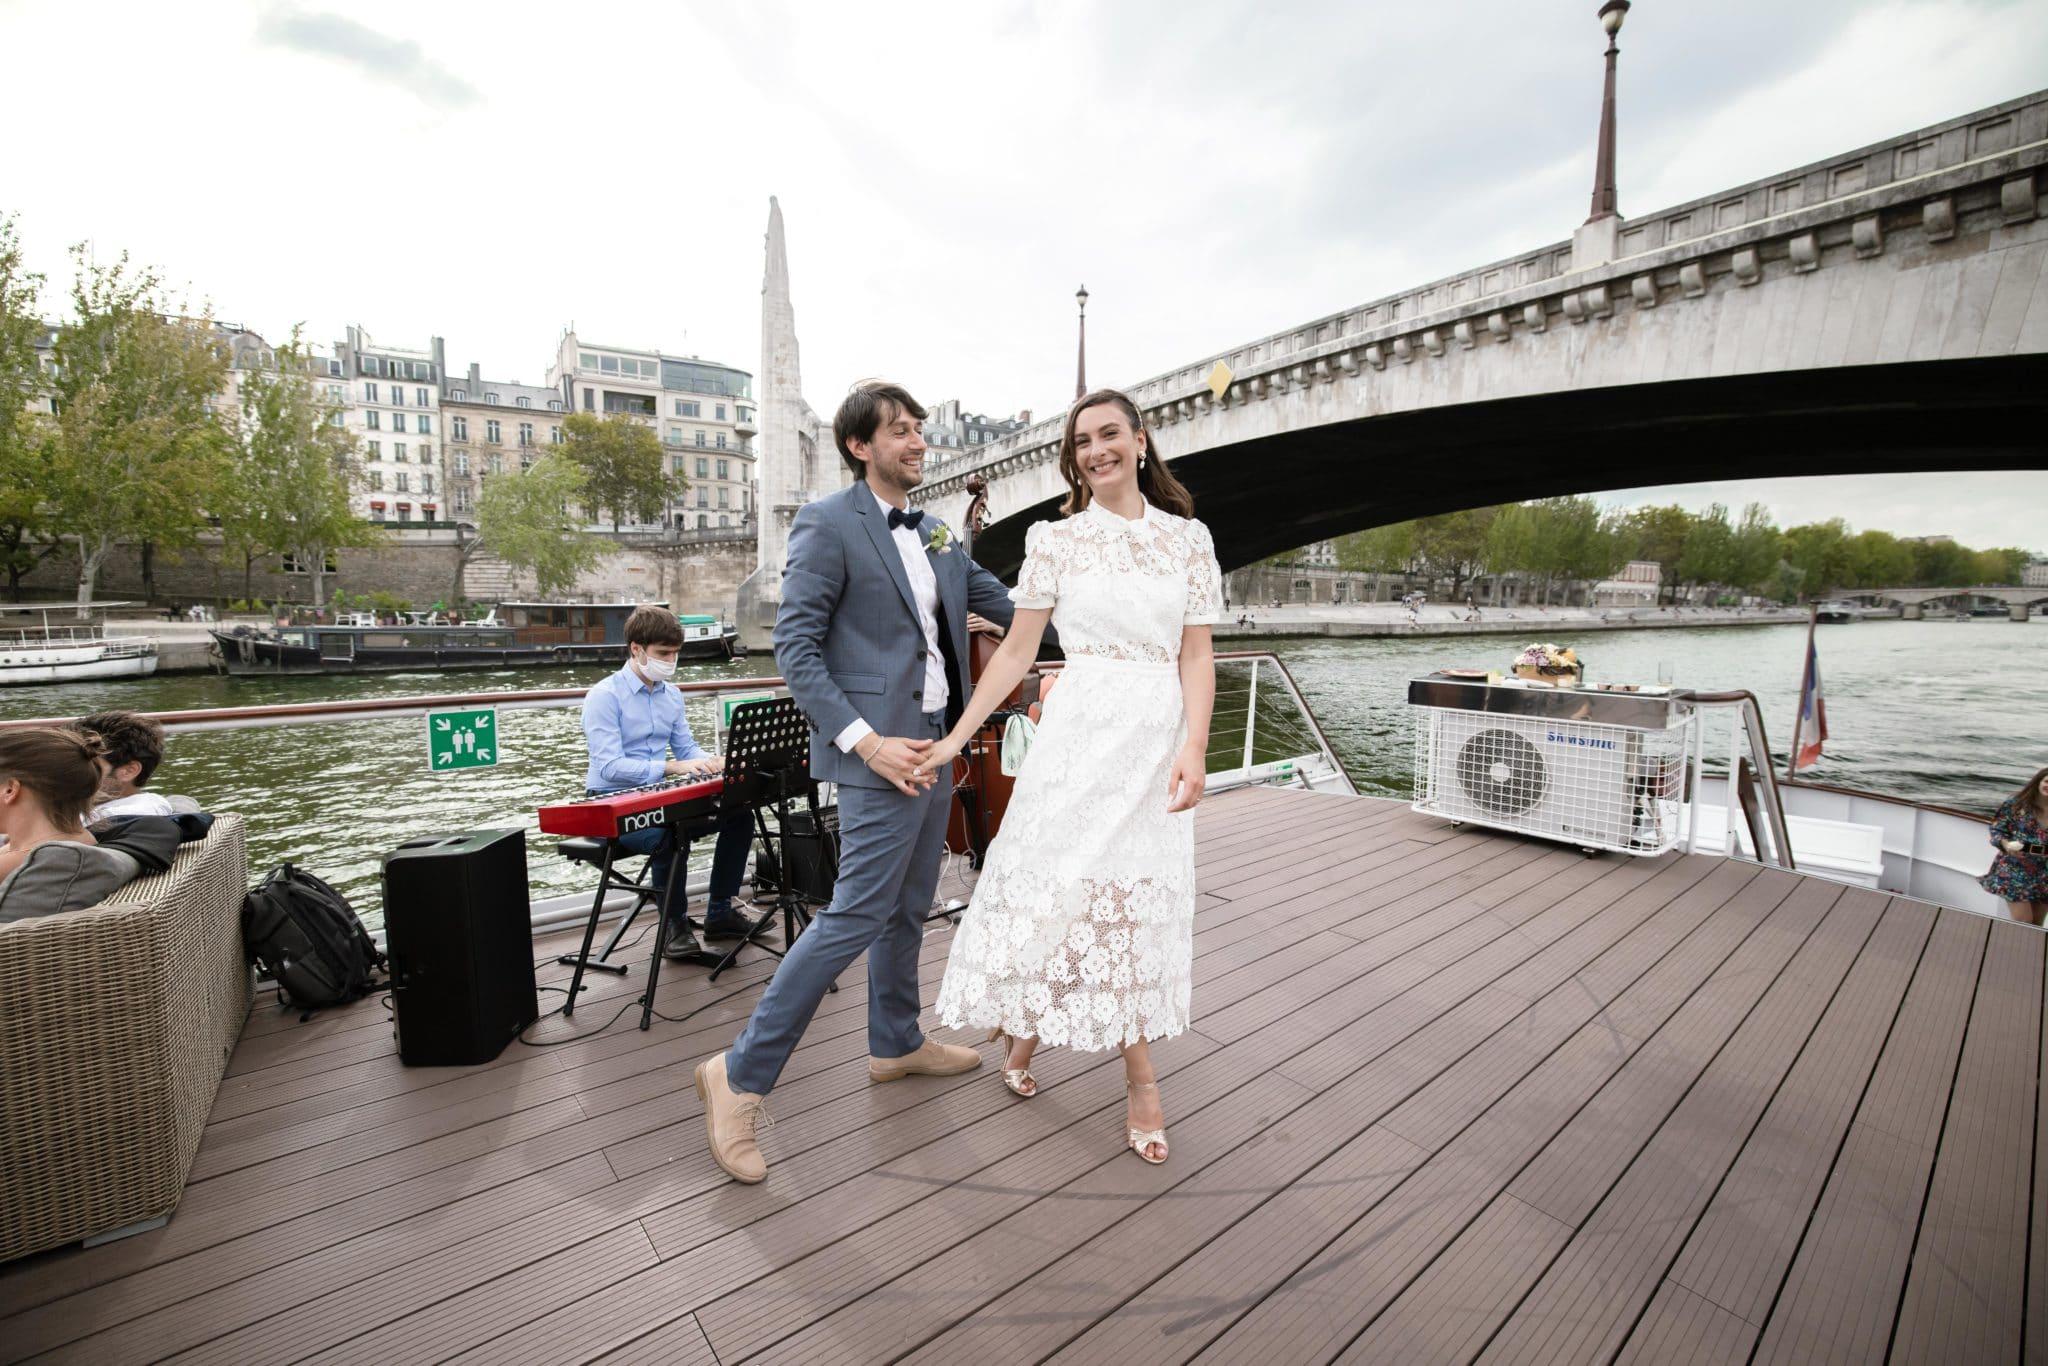 mariage civil mairie paris